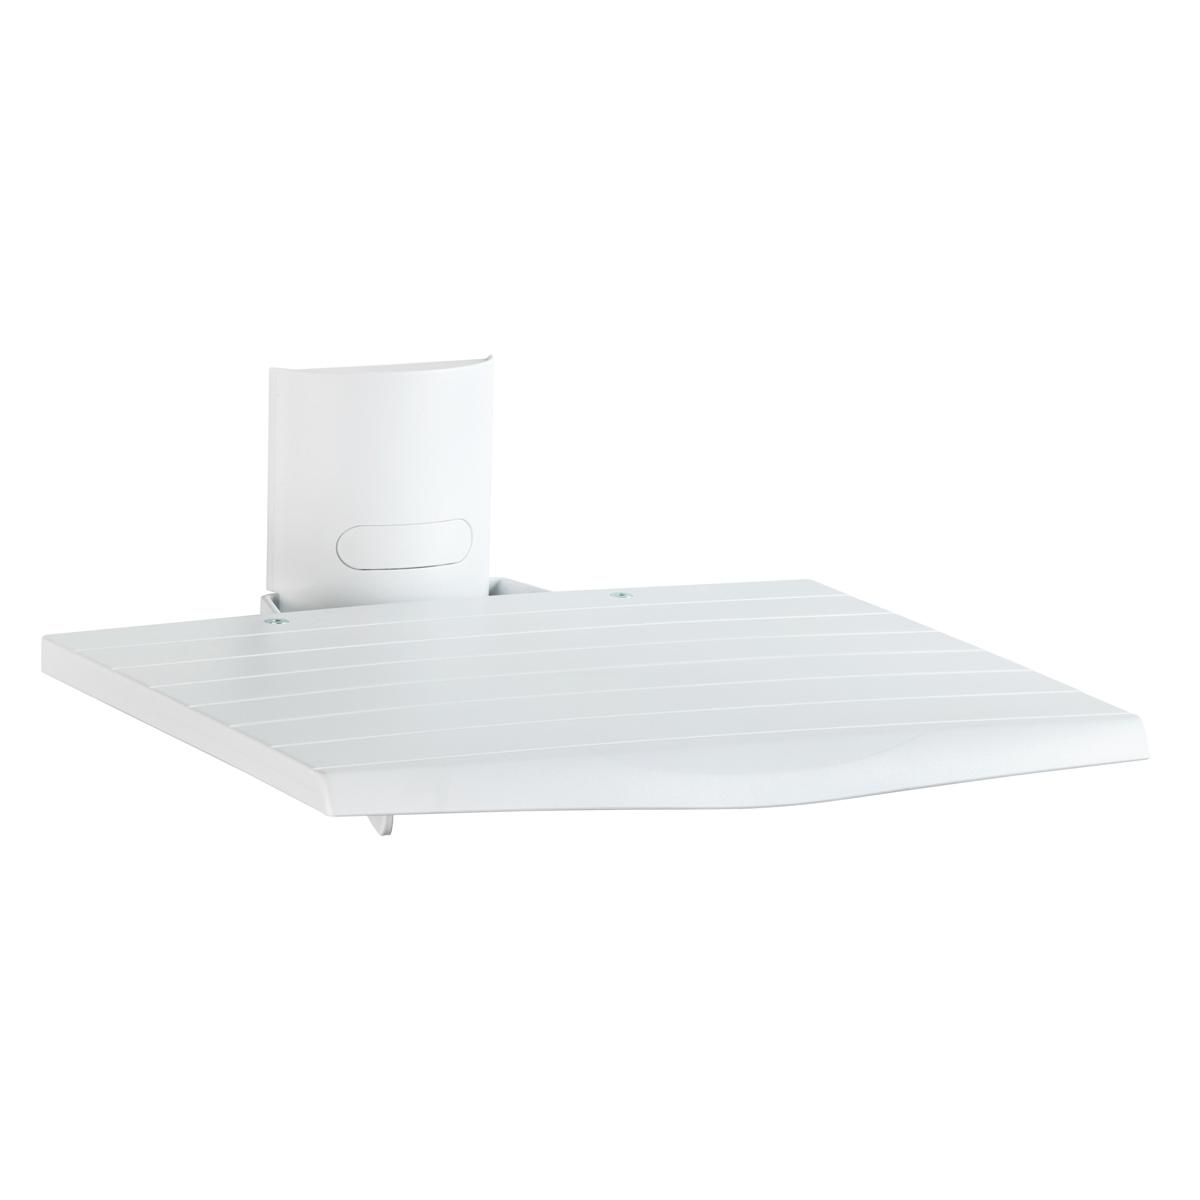 Meliconi av support blanc meuble tv meliconi sur - Support tv mural blanc ...